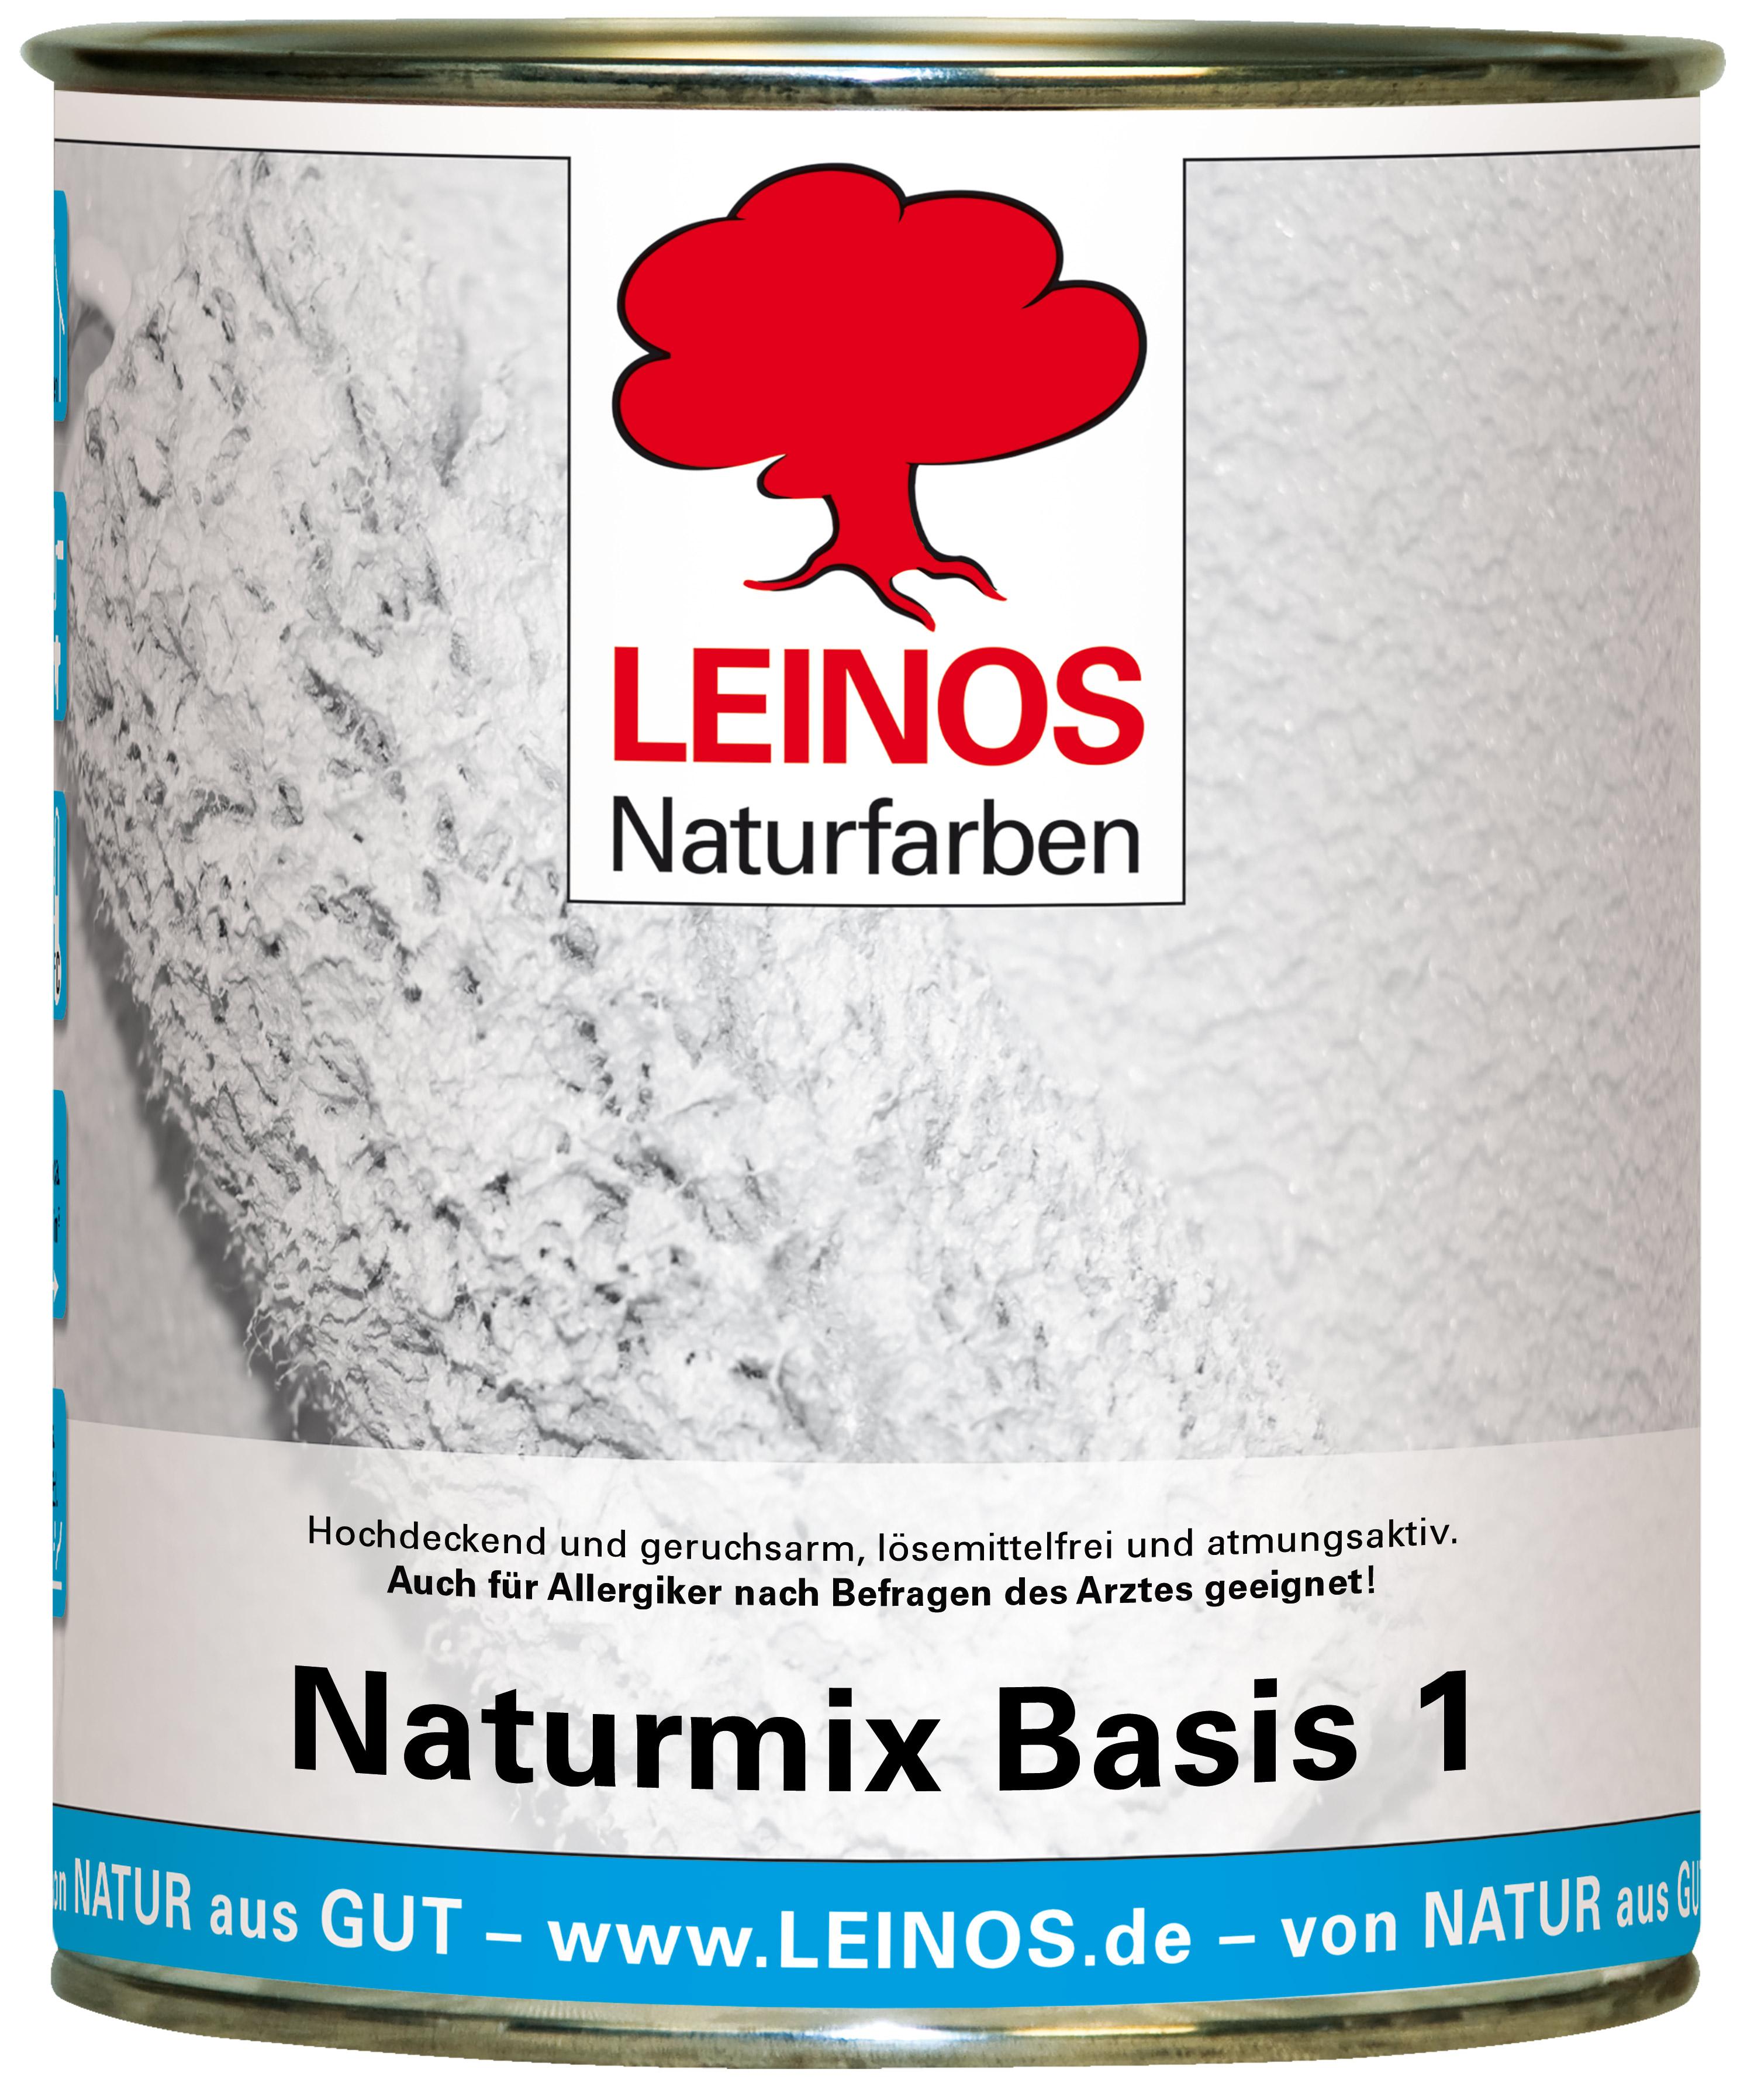 Leinos Naturmix